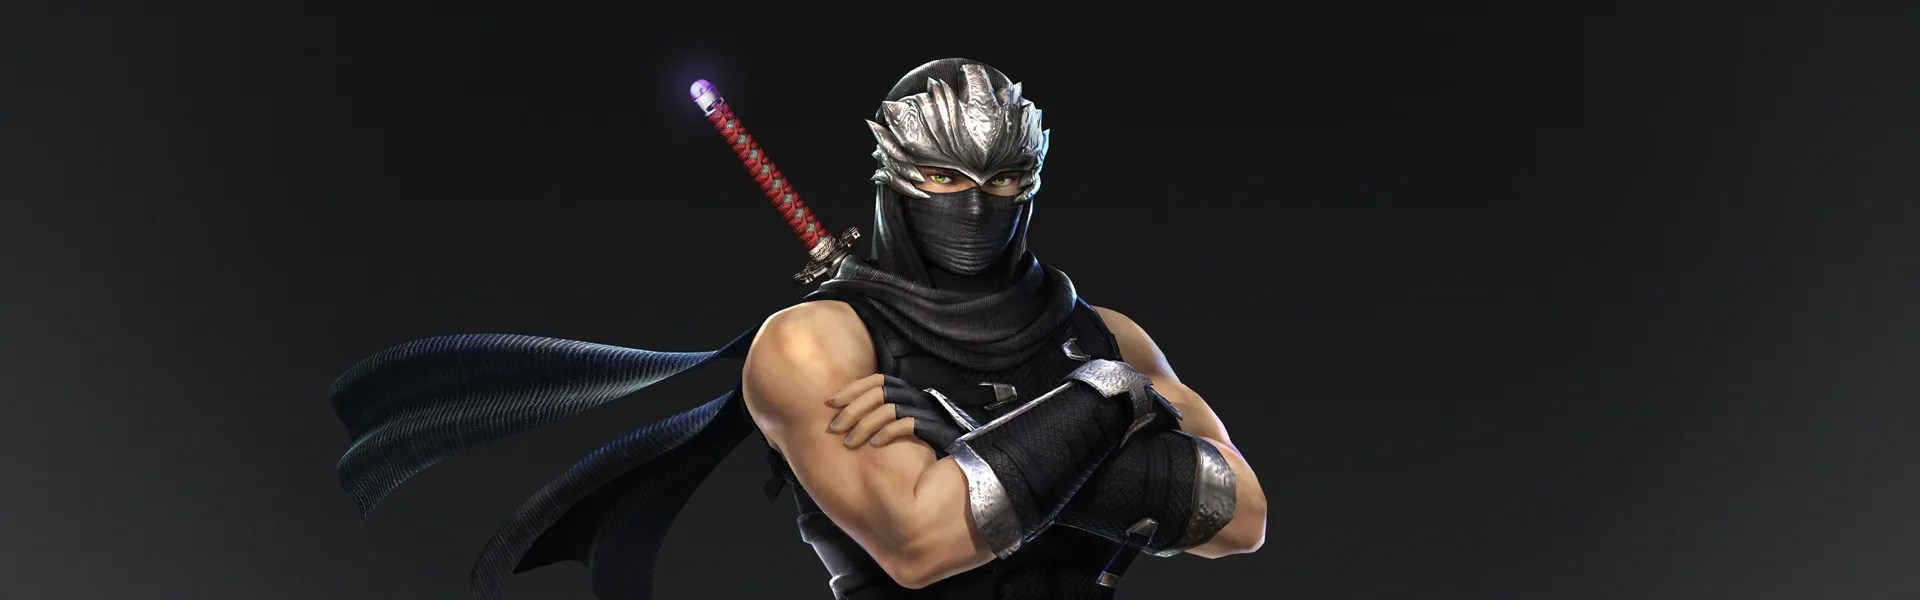 Ninja Gaiden hero Ryu Hayabusa joins Warriors Orochi 4 Ultimate's massive  character roster – PlayStation.Blog